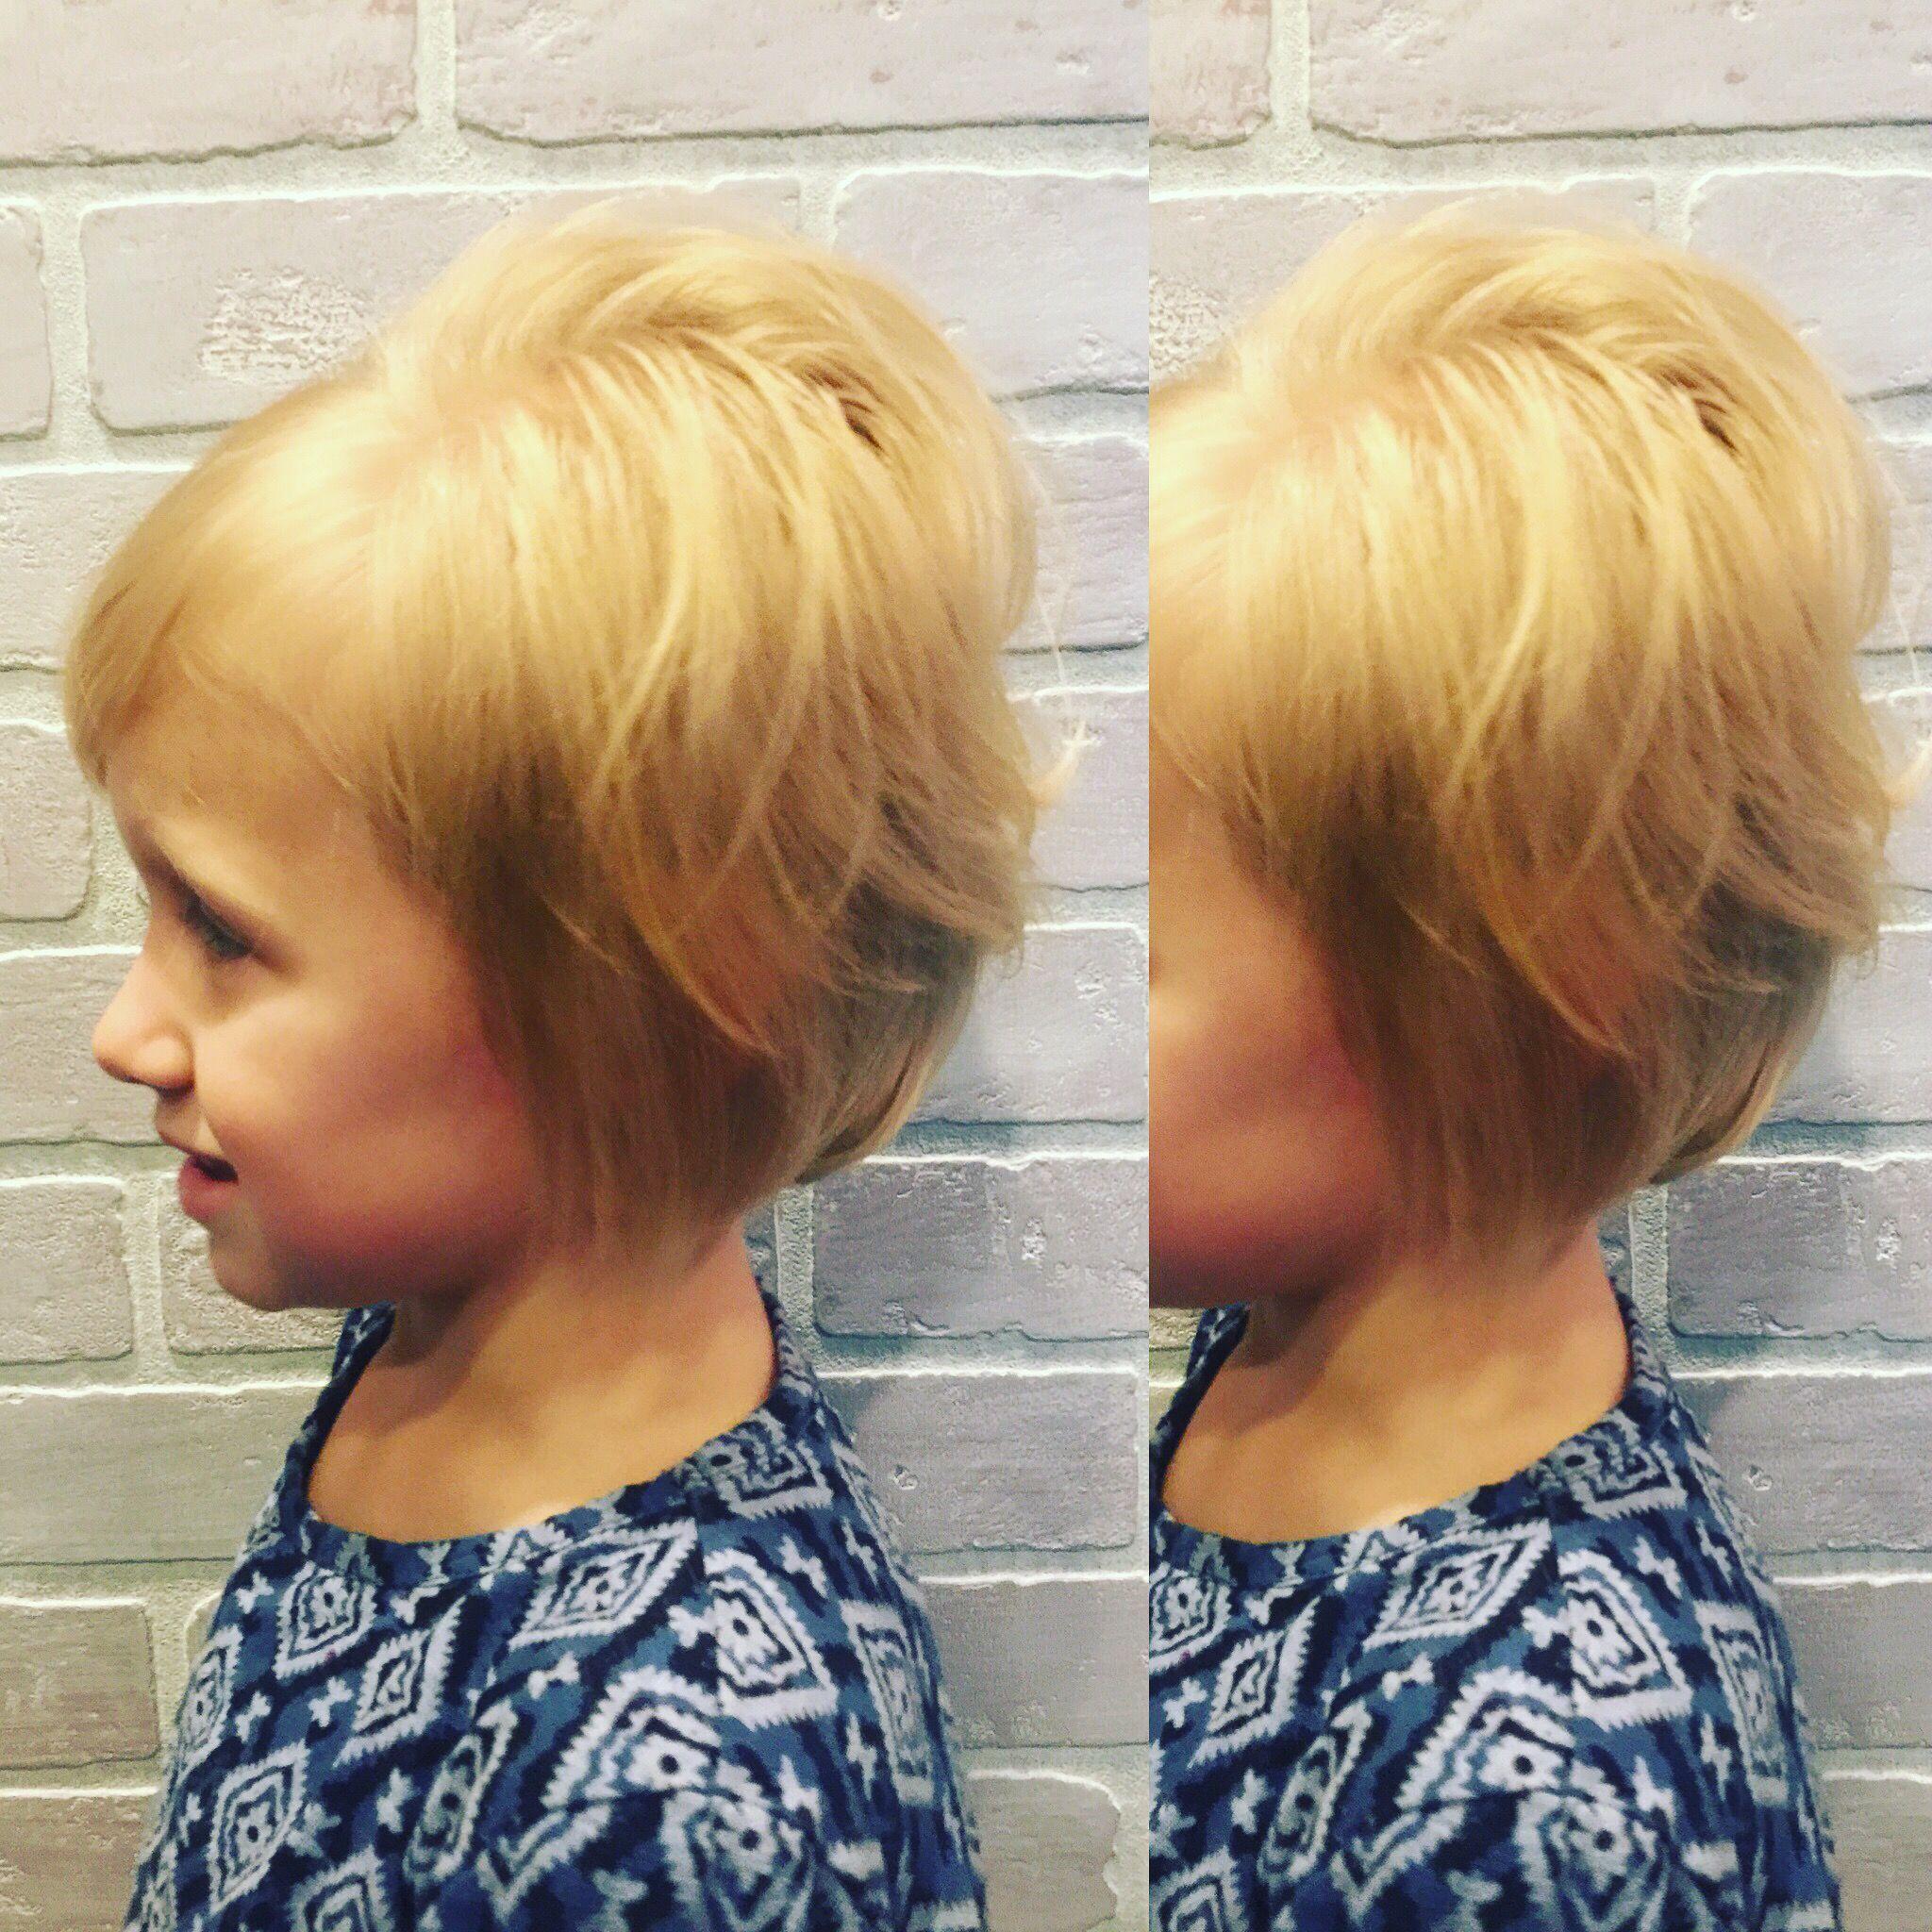 Children Haircut Bob Schalena Severs At Bel Ami Salon In Fort